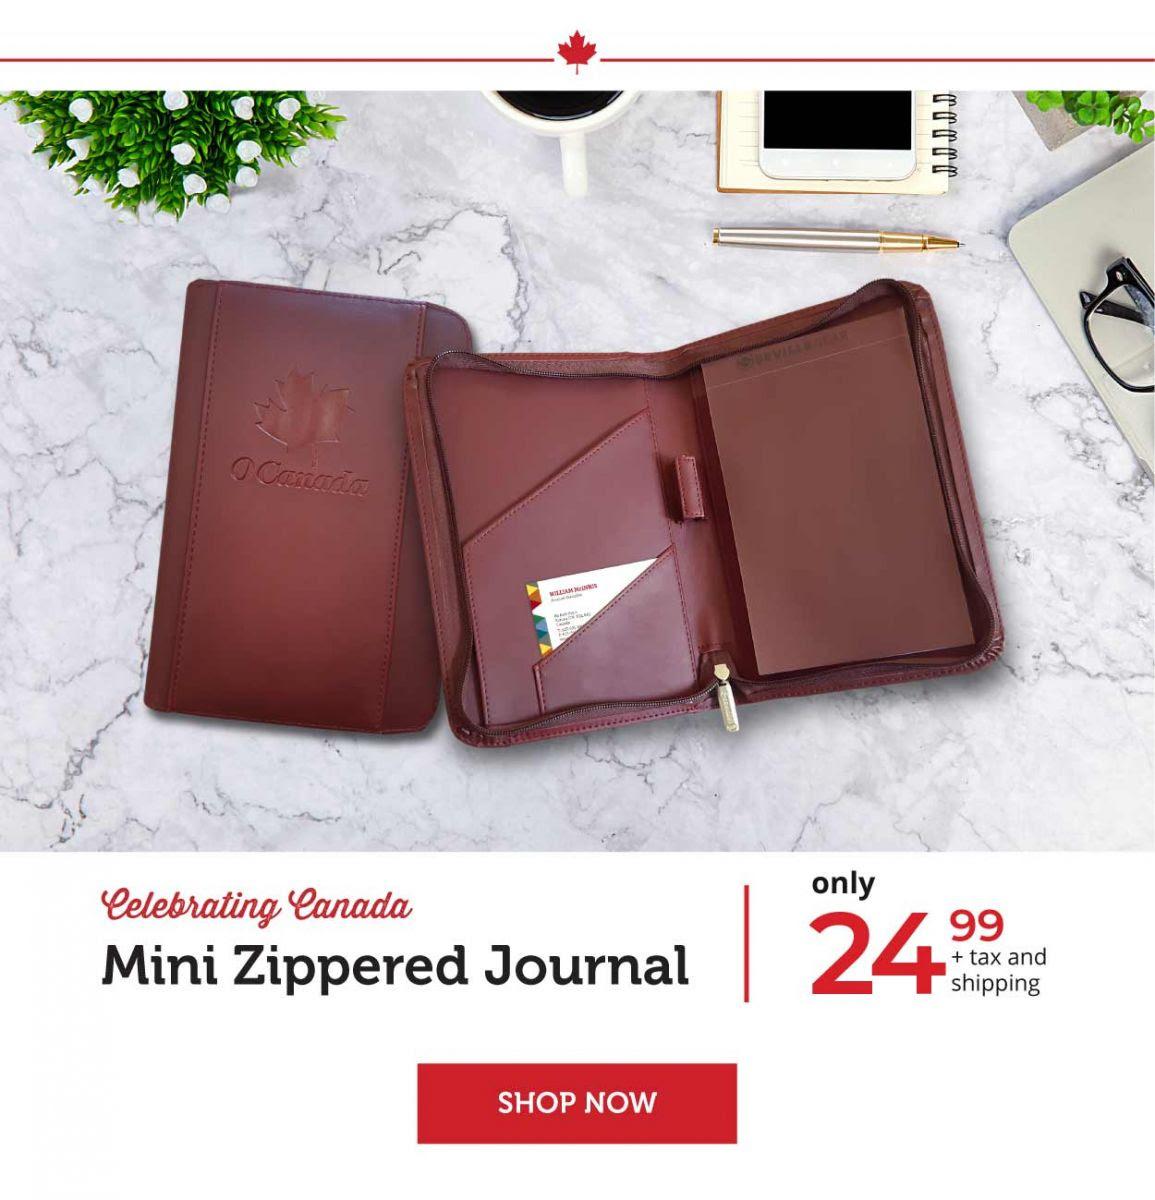 Mini Zippered Journal